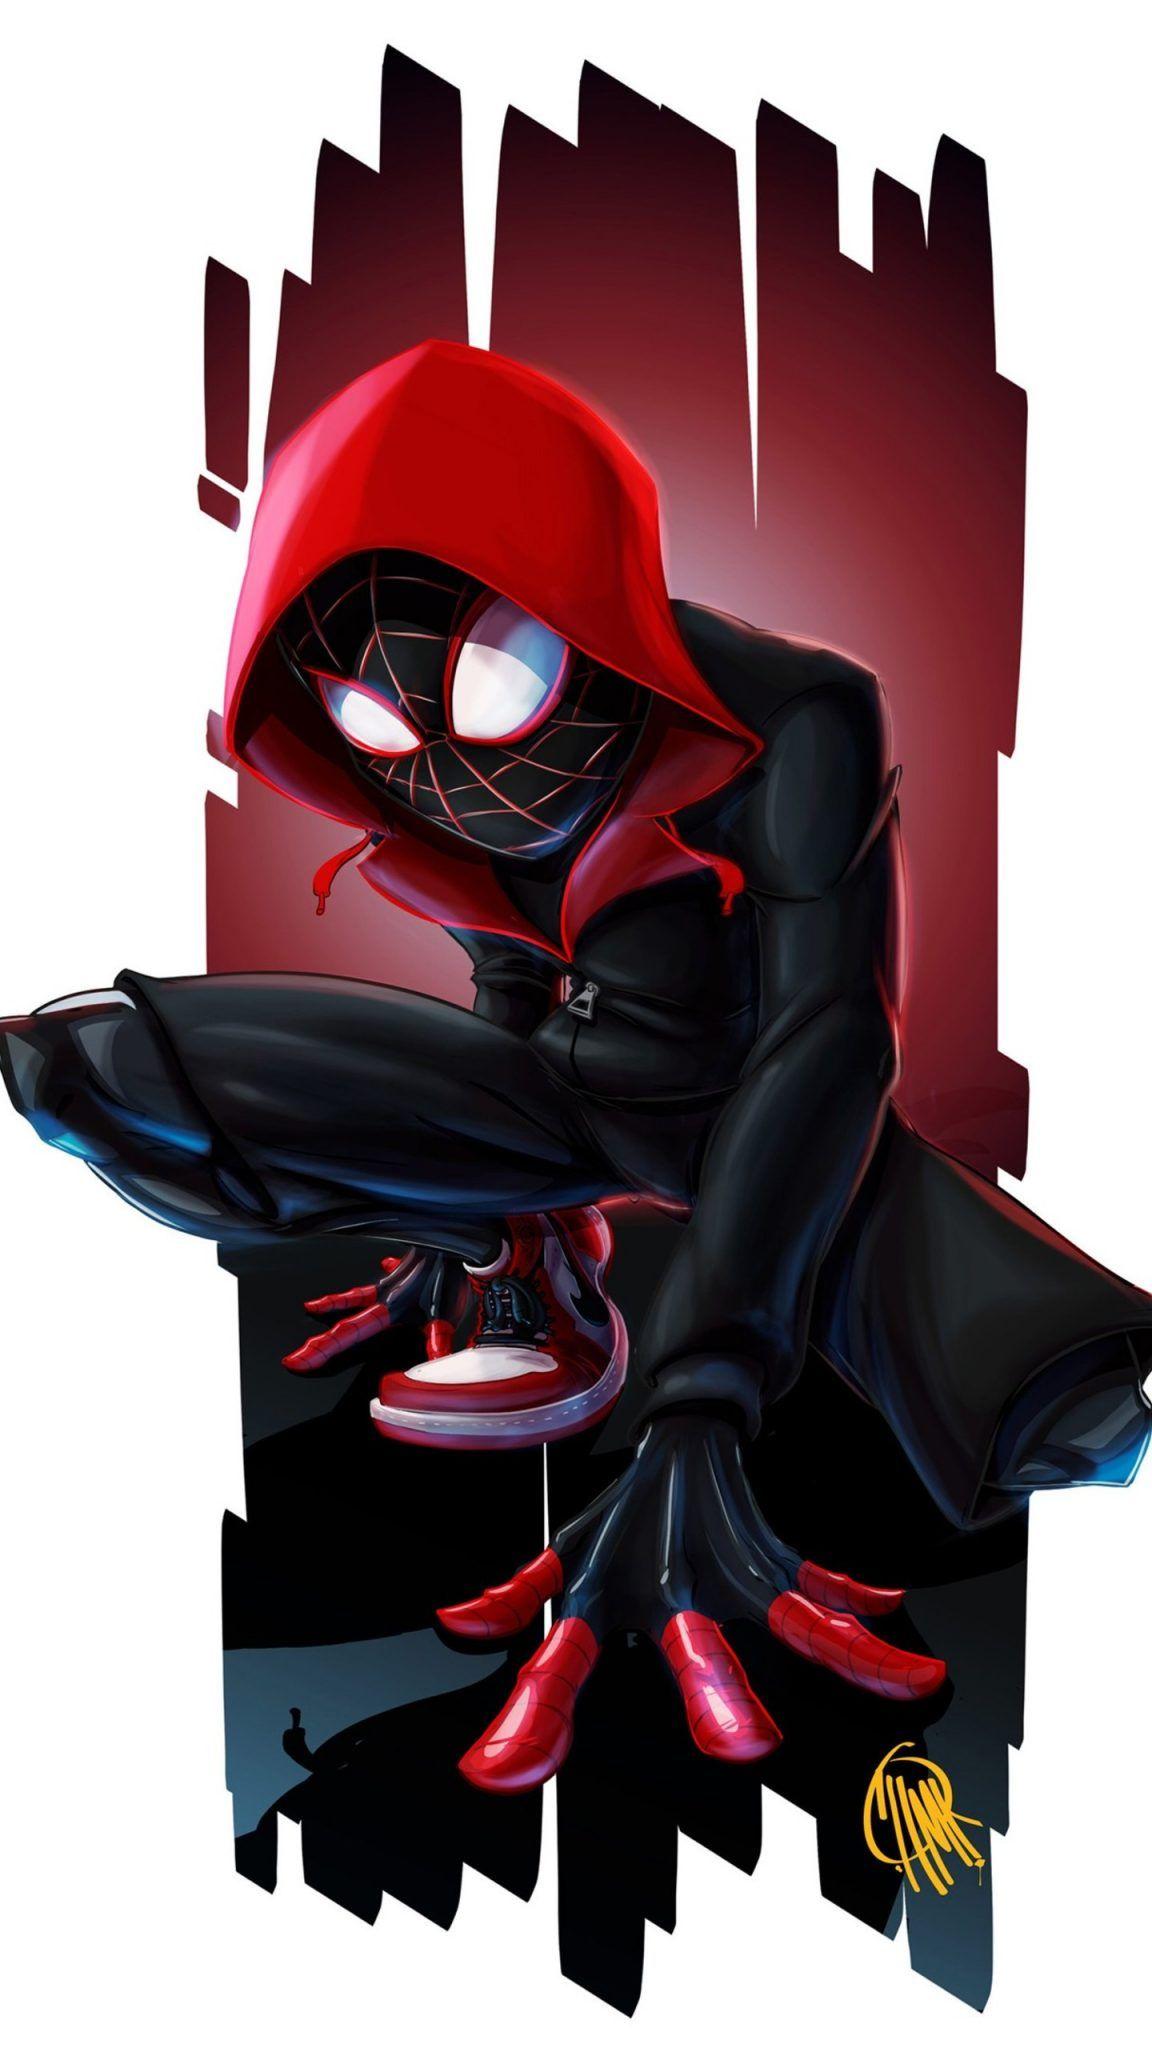 Black Spiderman Spider Verse Wallpaper Miles morales